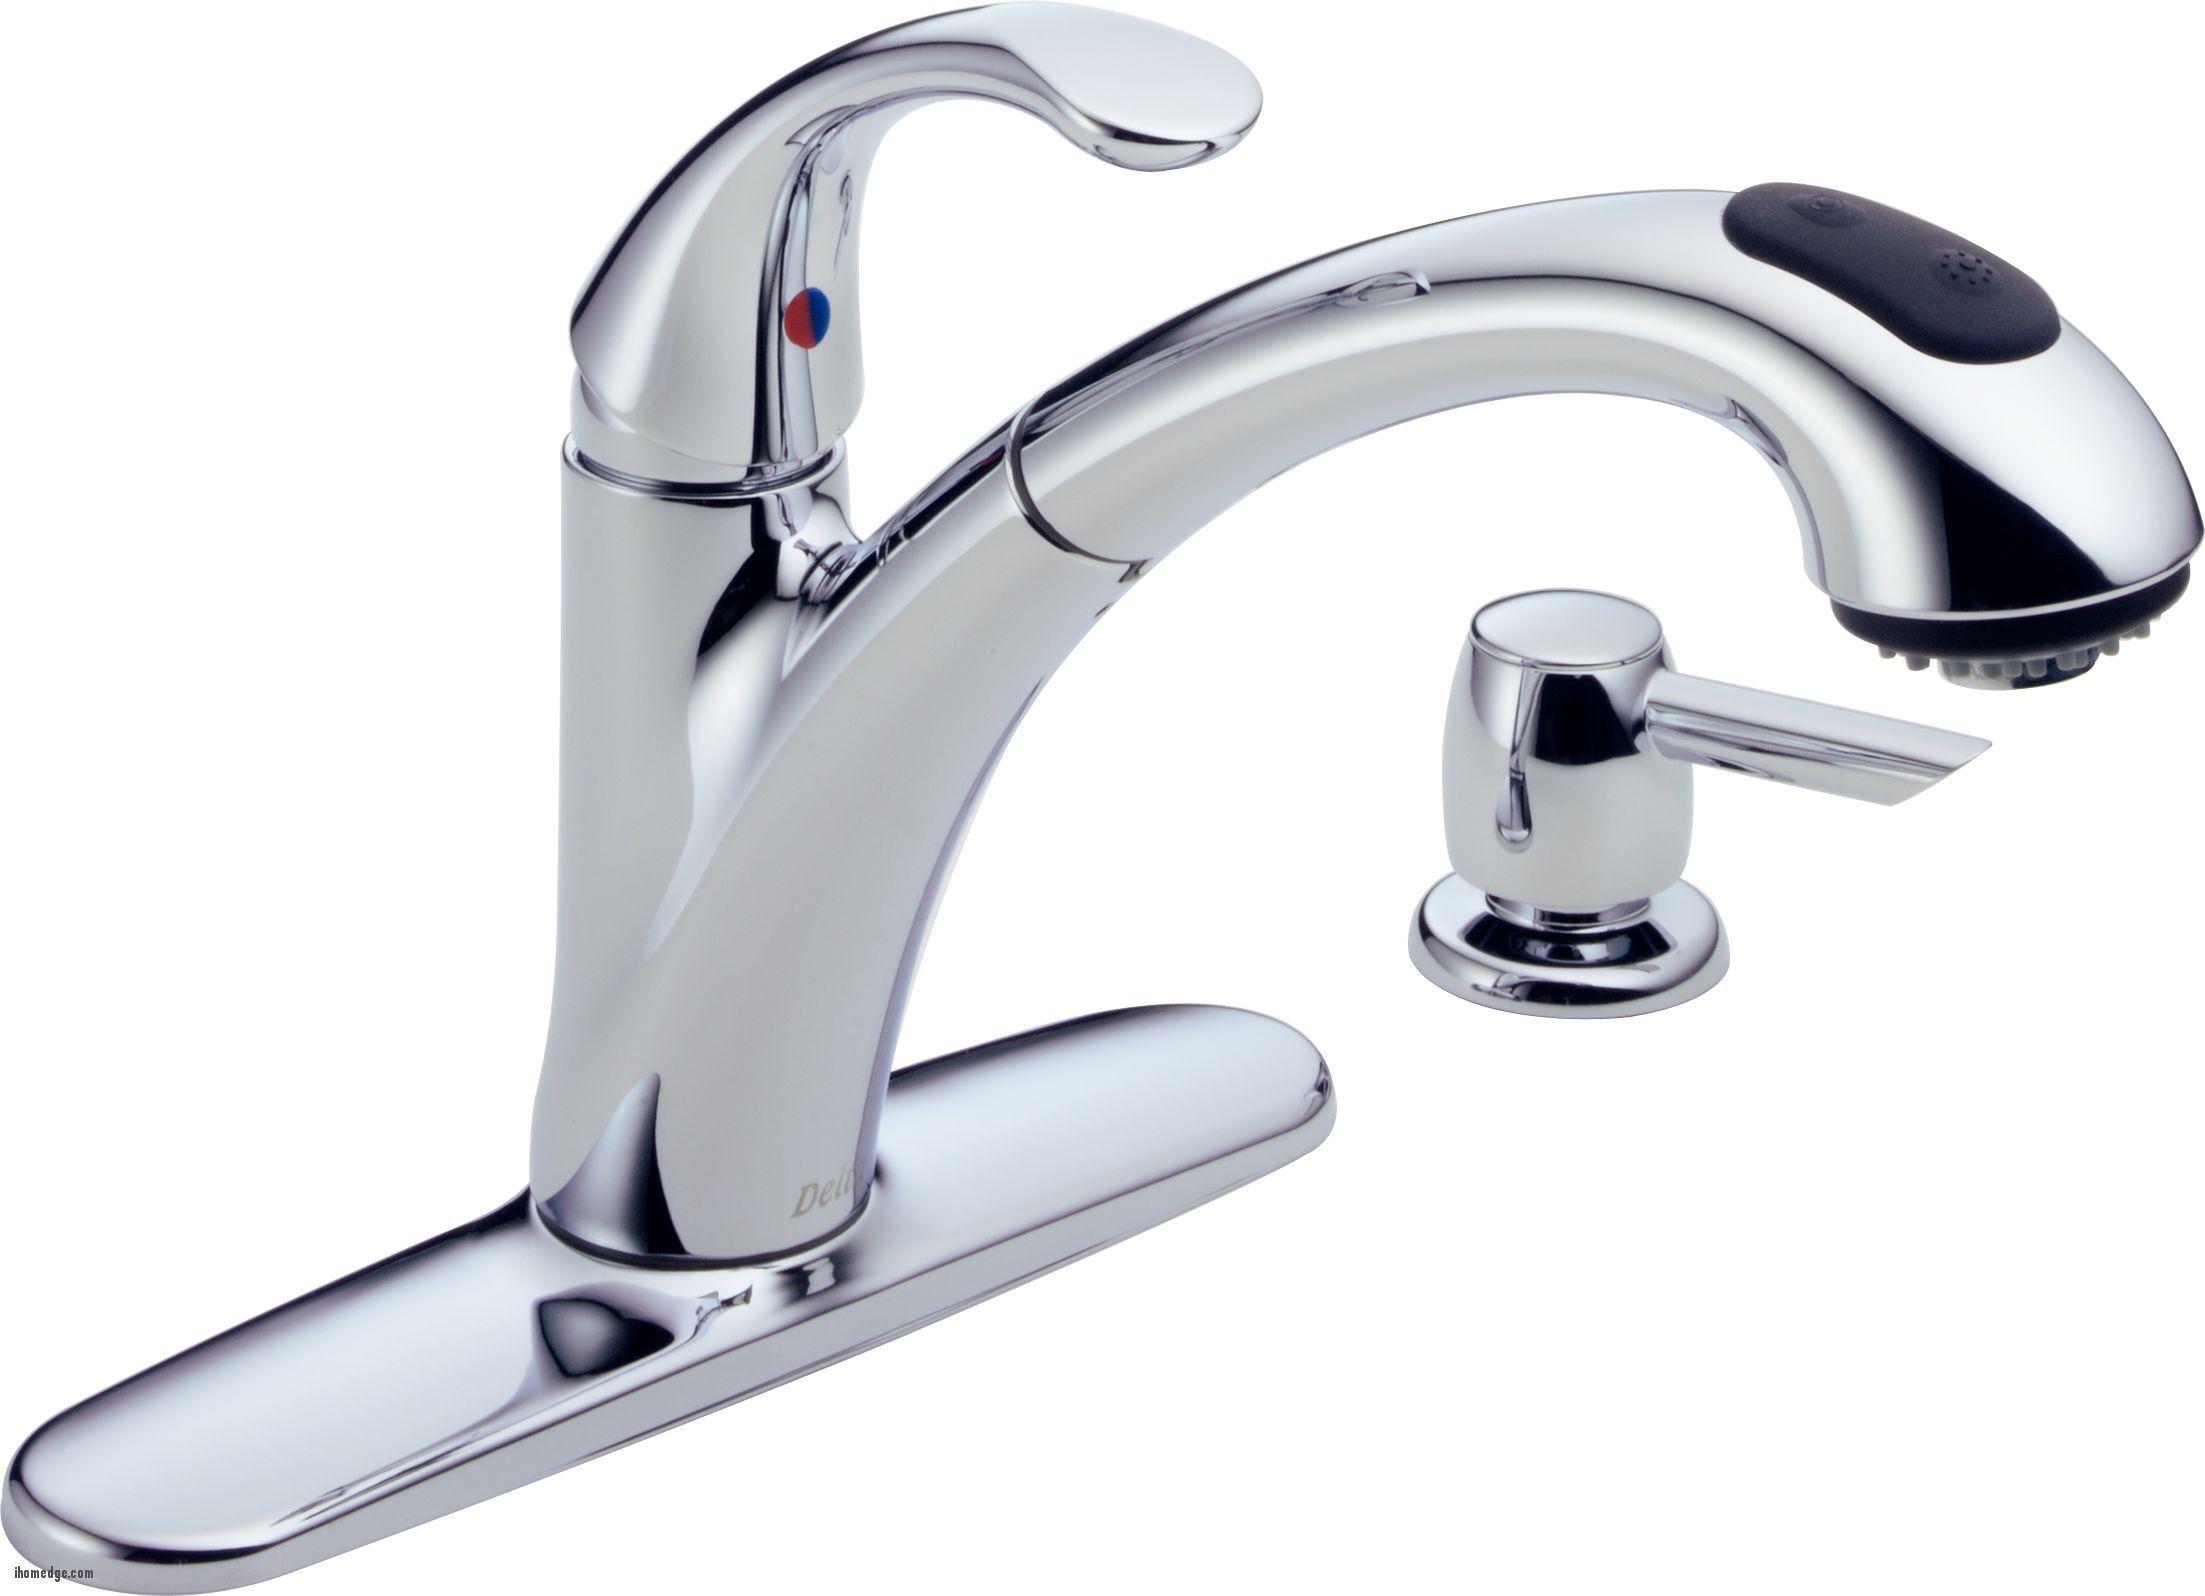 Inspirational Fresh Bathroom Parts Delta Faucets Home Depot Shower Faucet Http